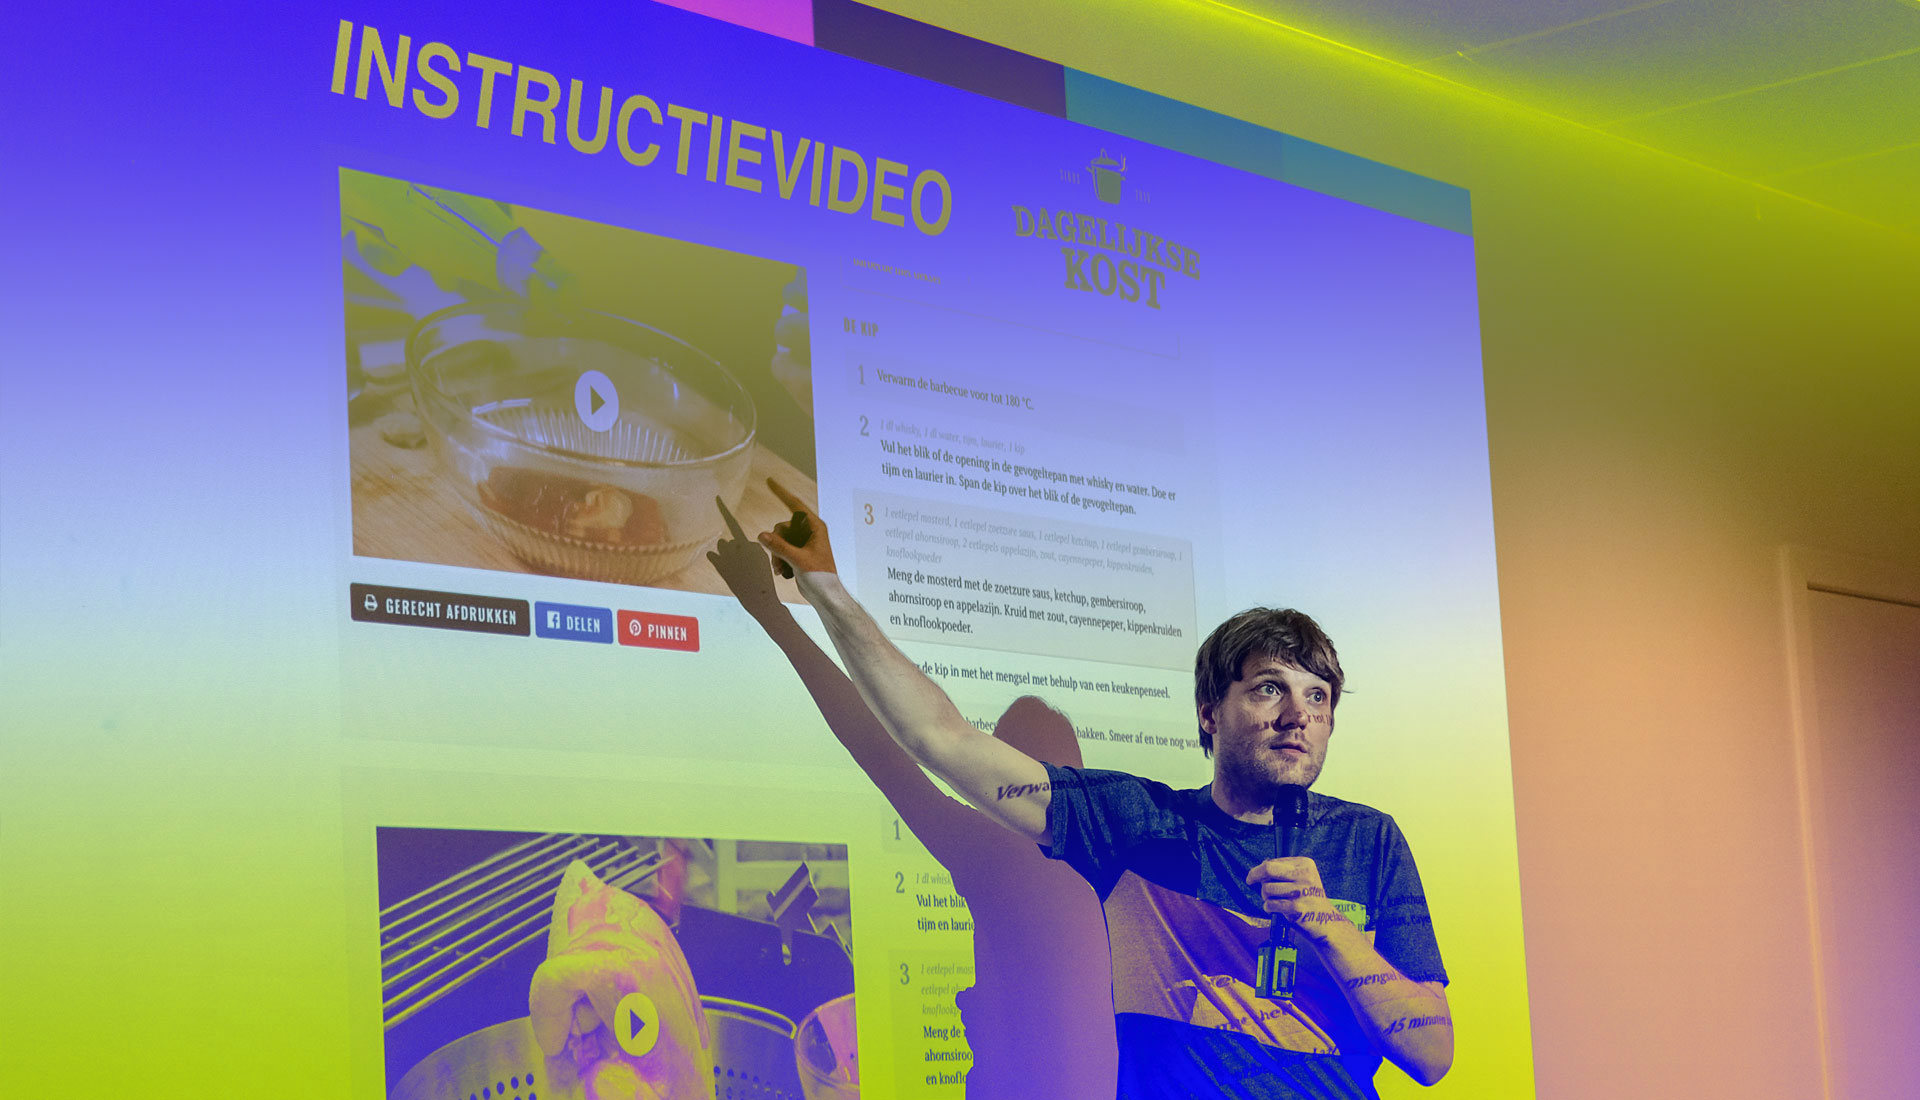 let's talk video hotel hungaria howest communicatiemanagement